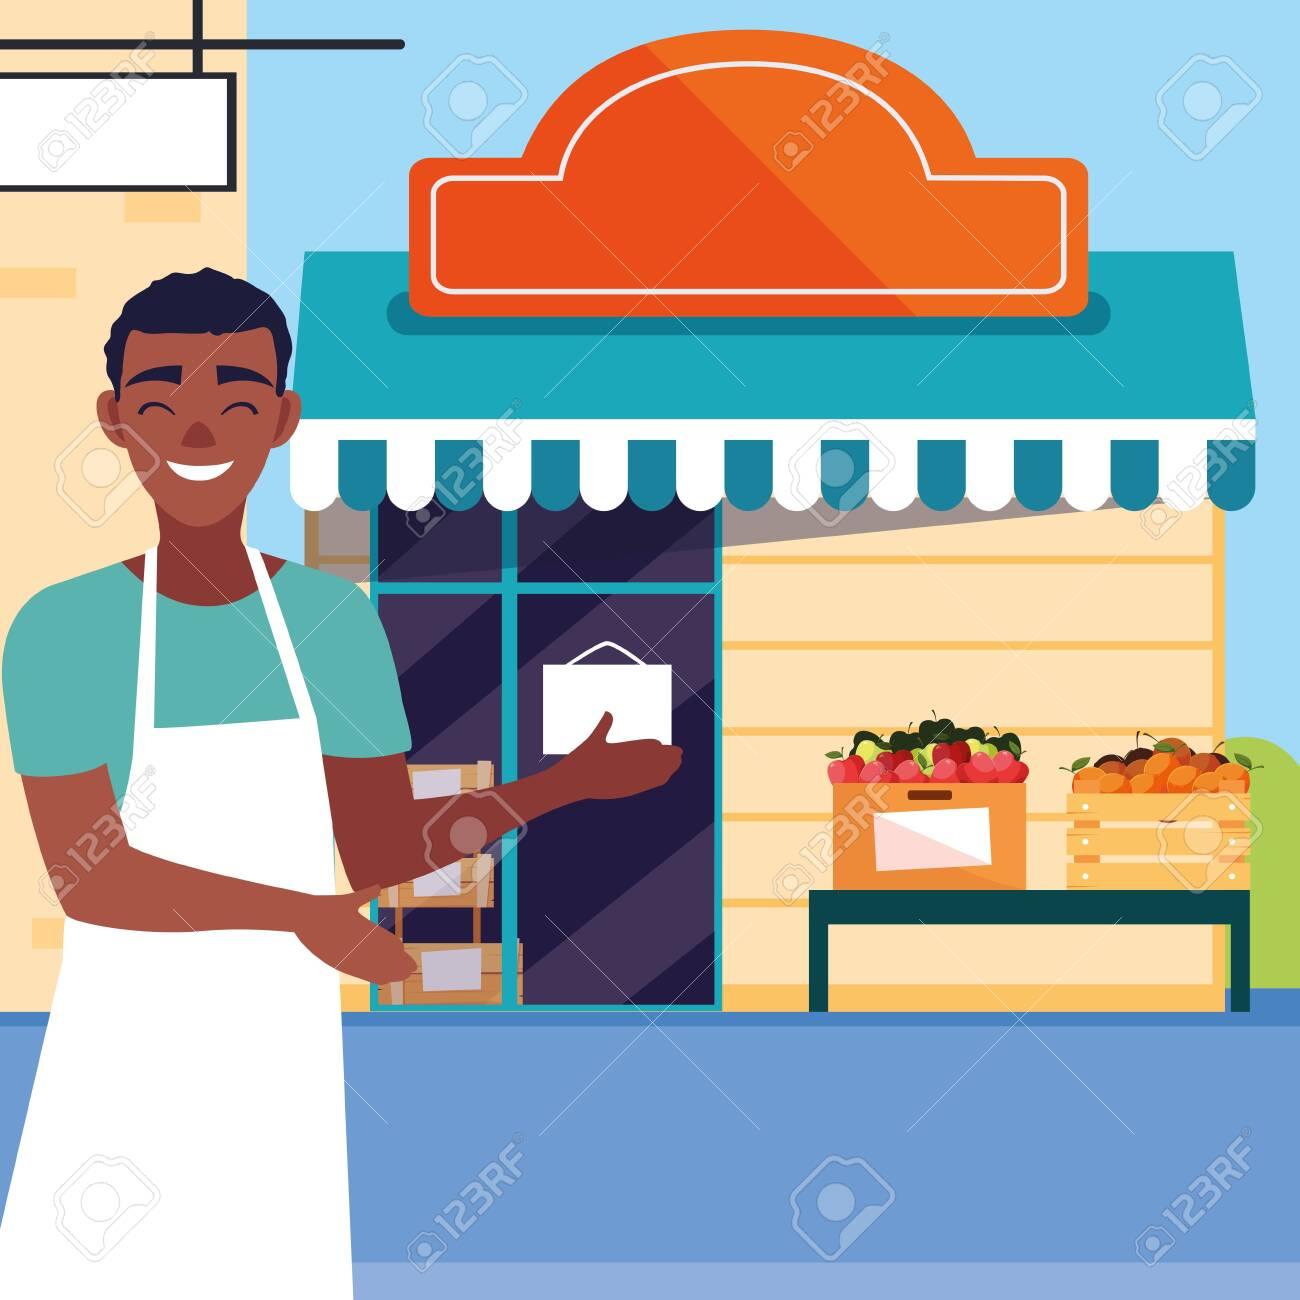 salesman with fruits store facade building vector illustration design - 153947299